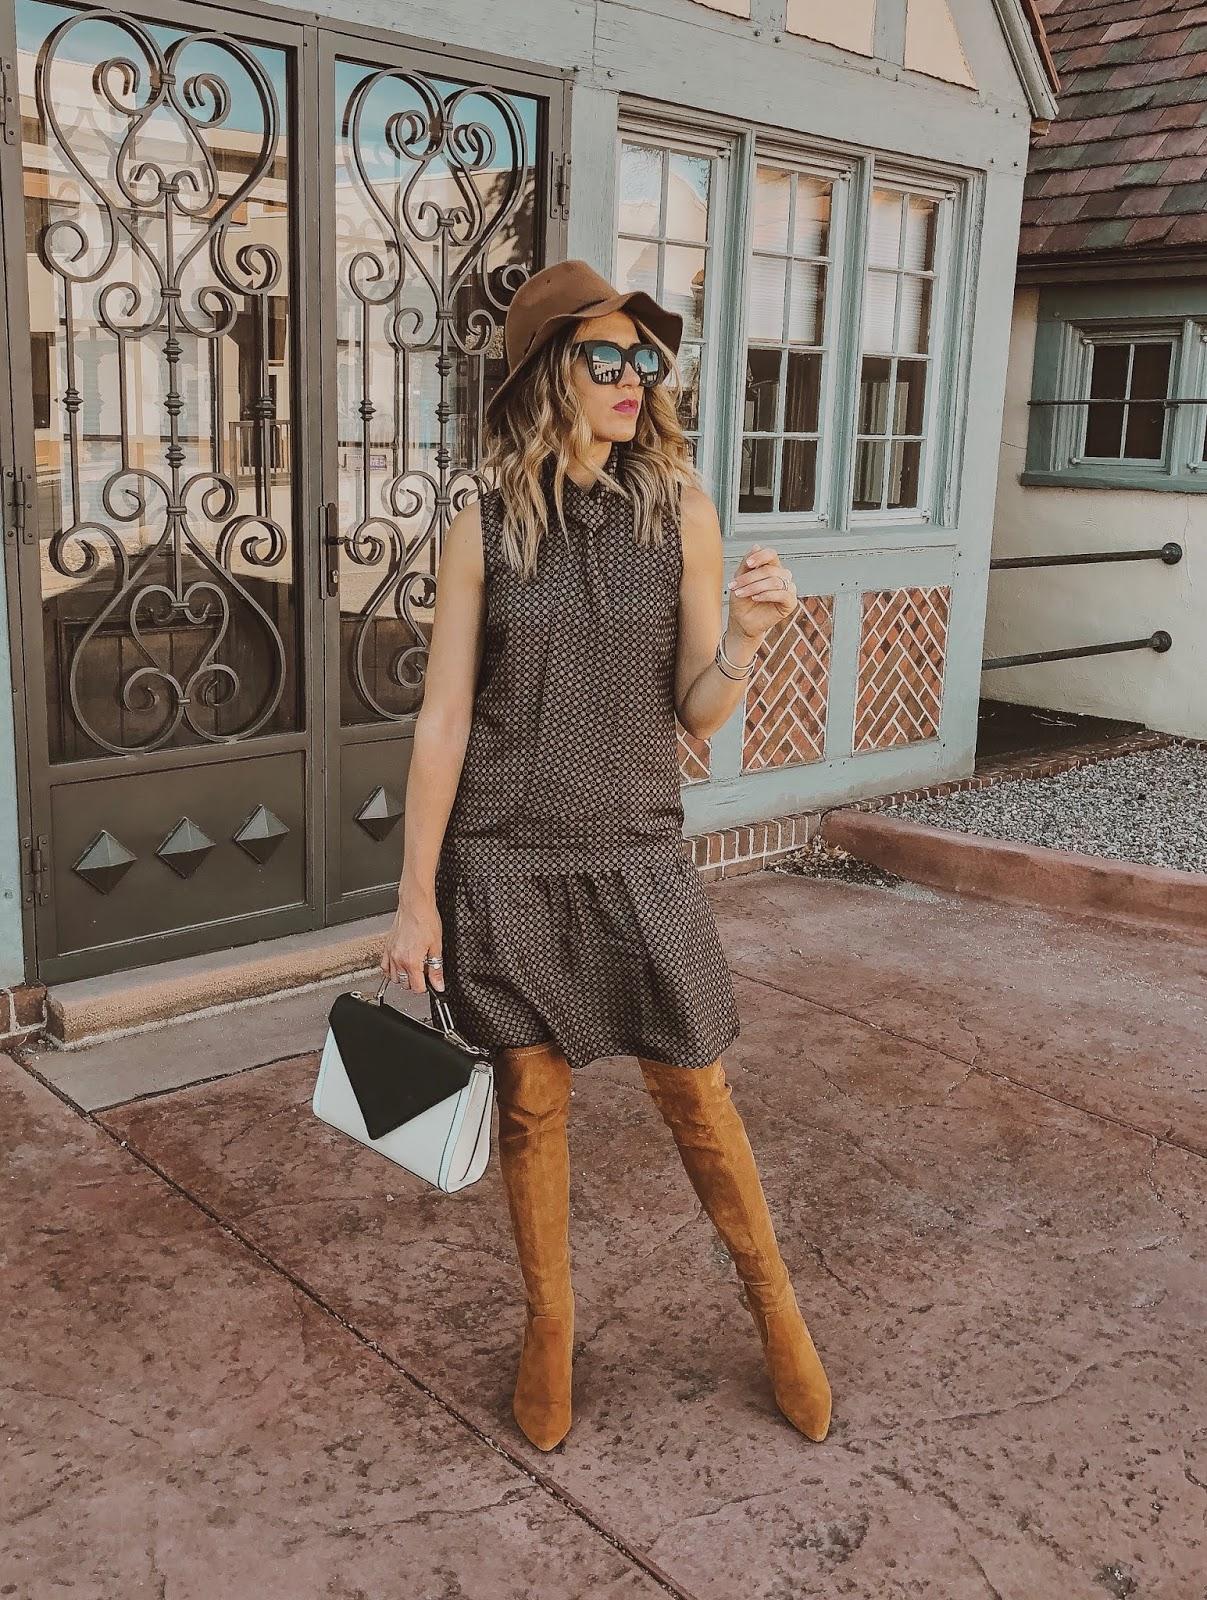 Drop Waist Dress With OTK Boots